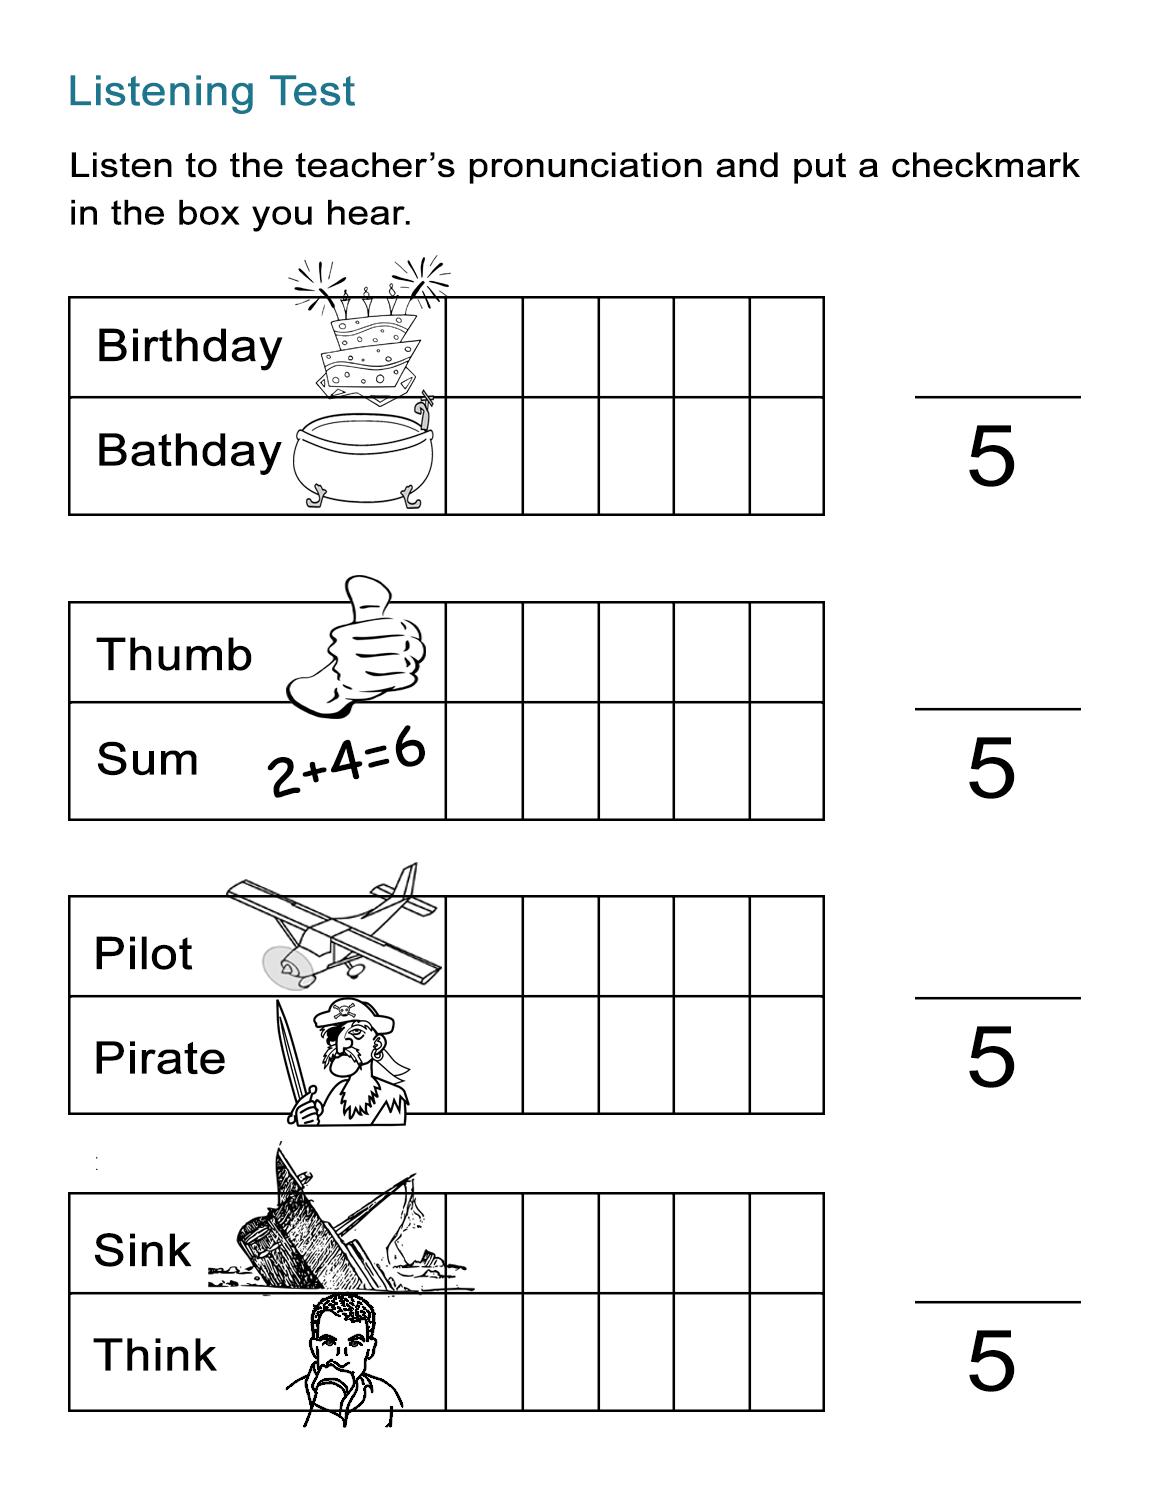 Workbooks pronunciation key worksheets : 43 Free ESL Worksheets that Enable English Language Learners - All ESL